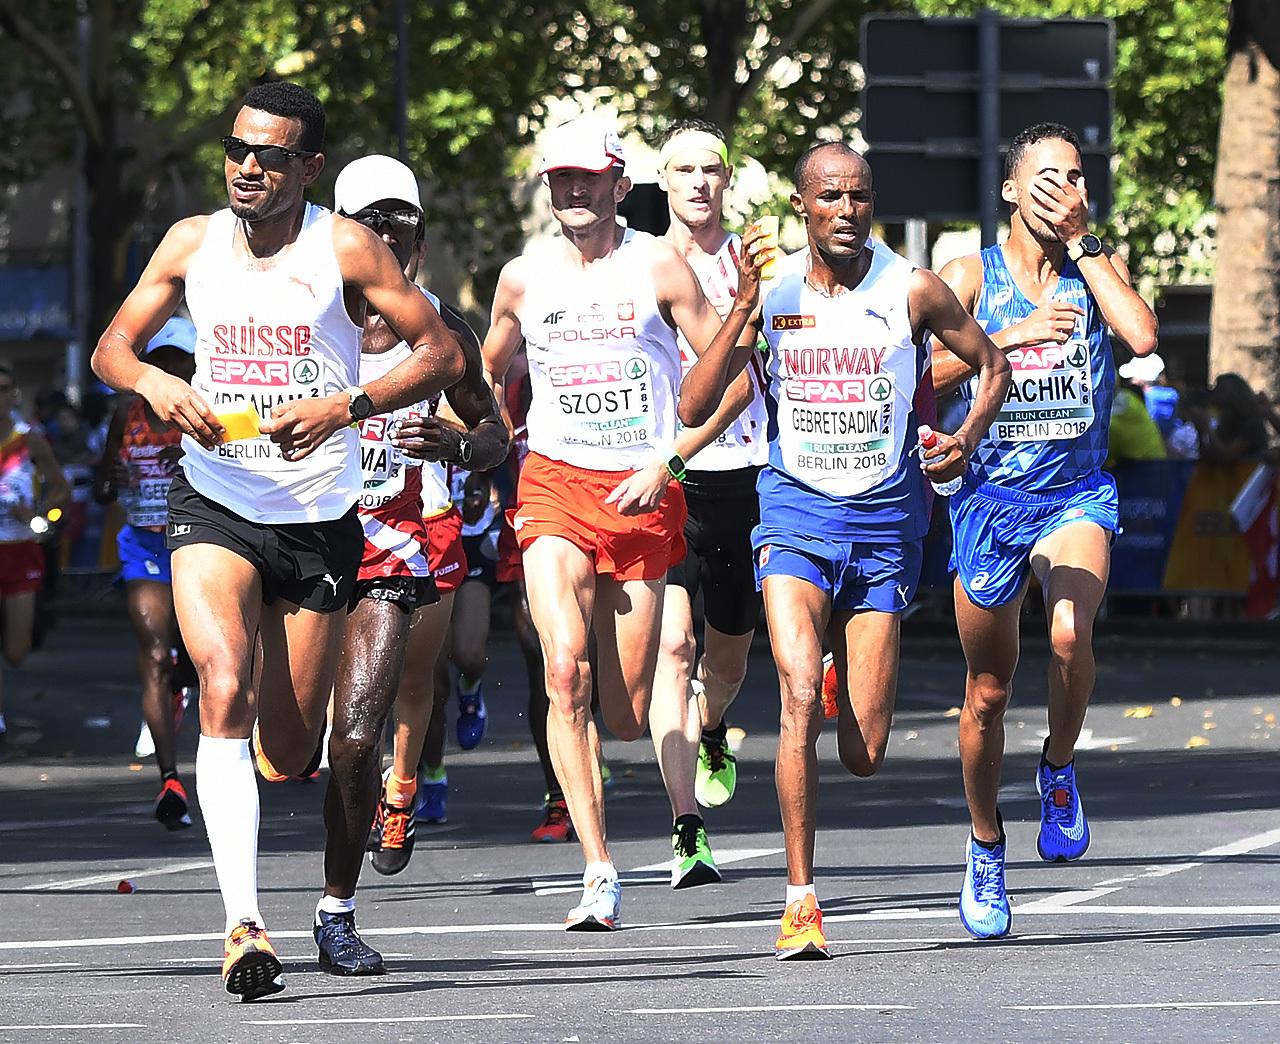 maraton-menn-negash-20km_50D7691.jpg